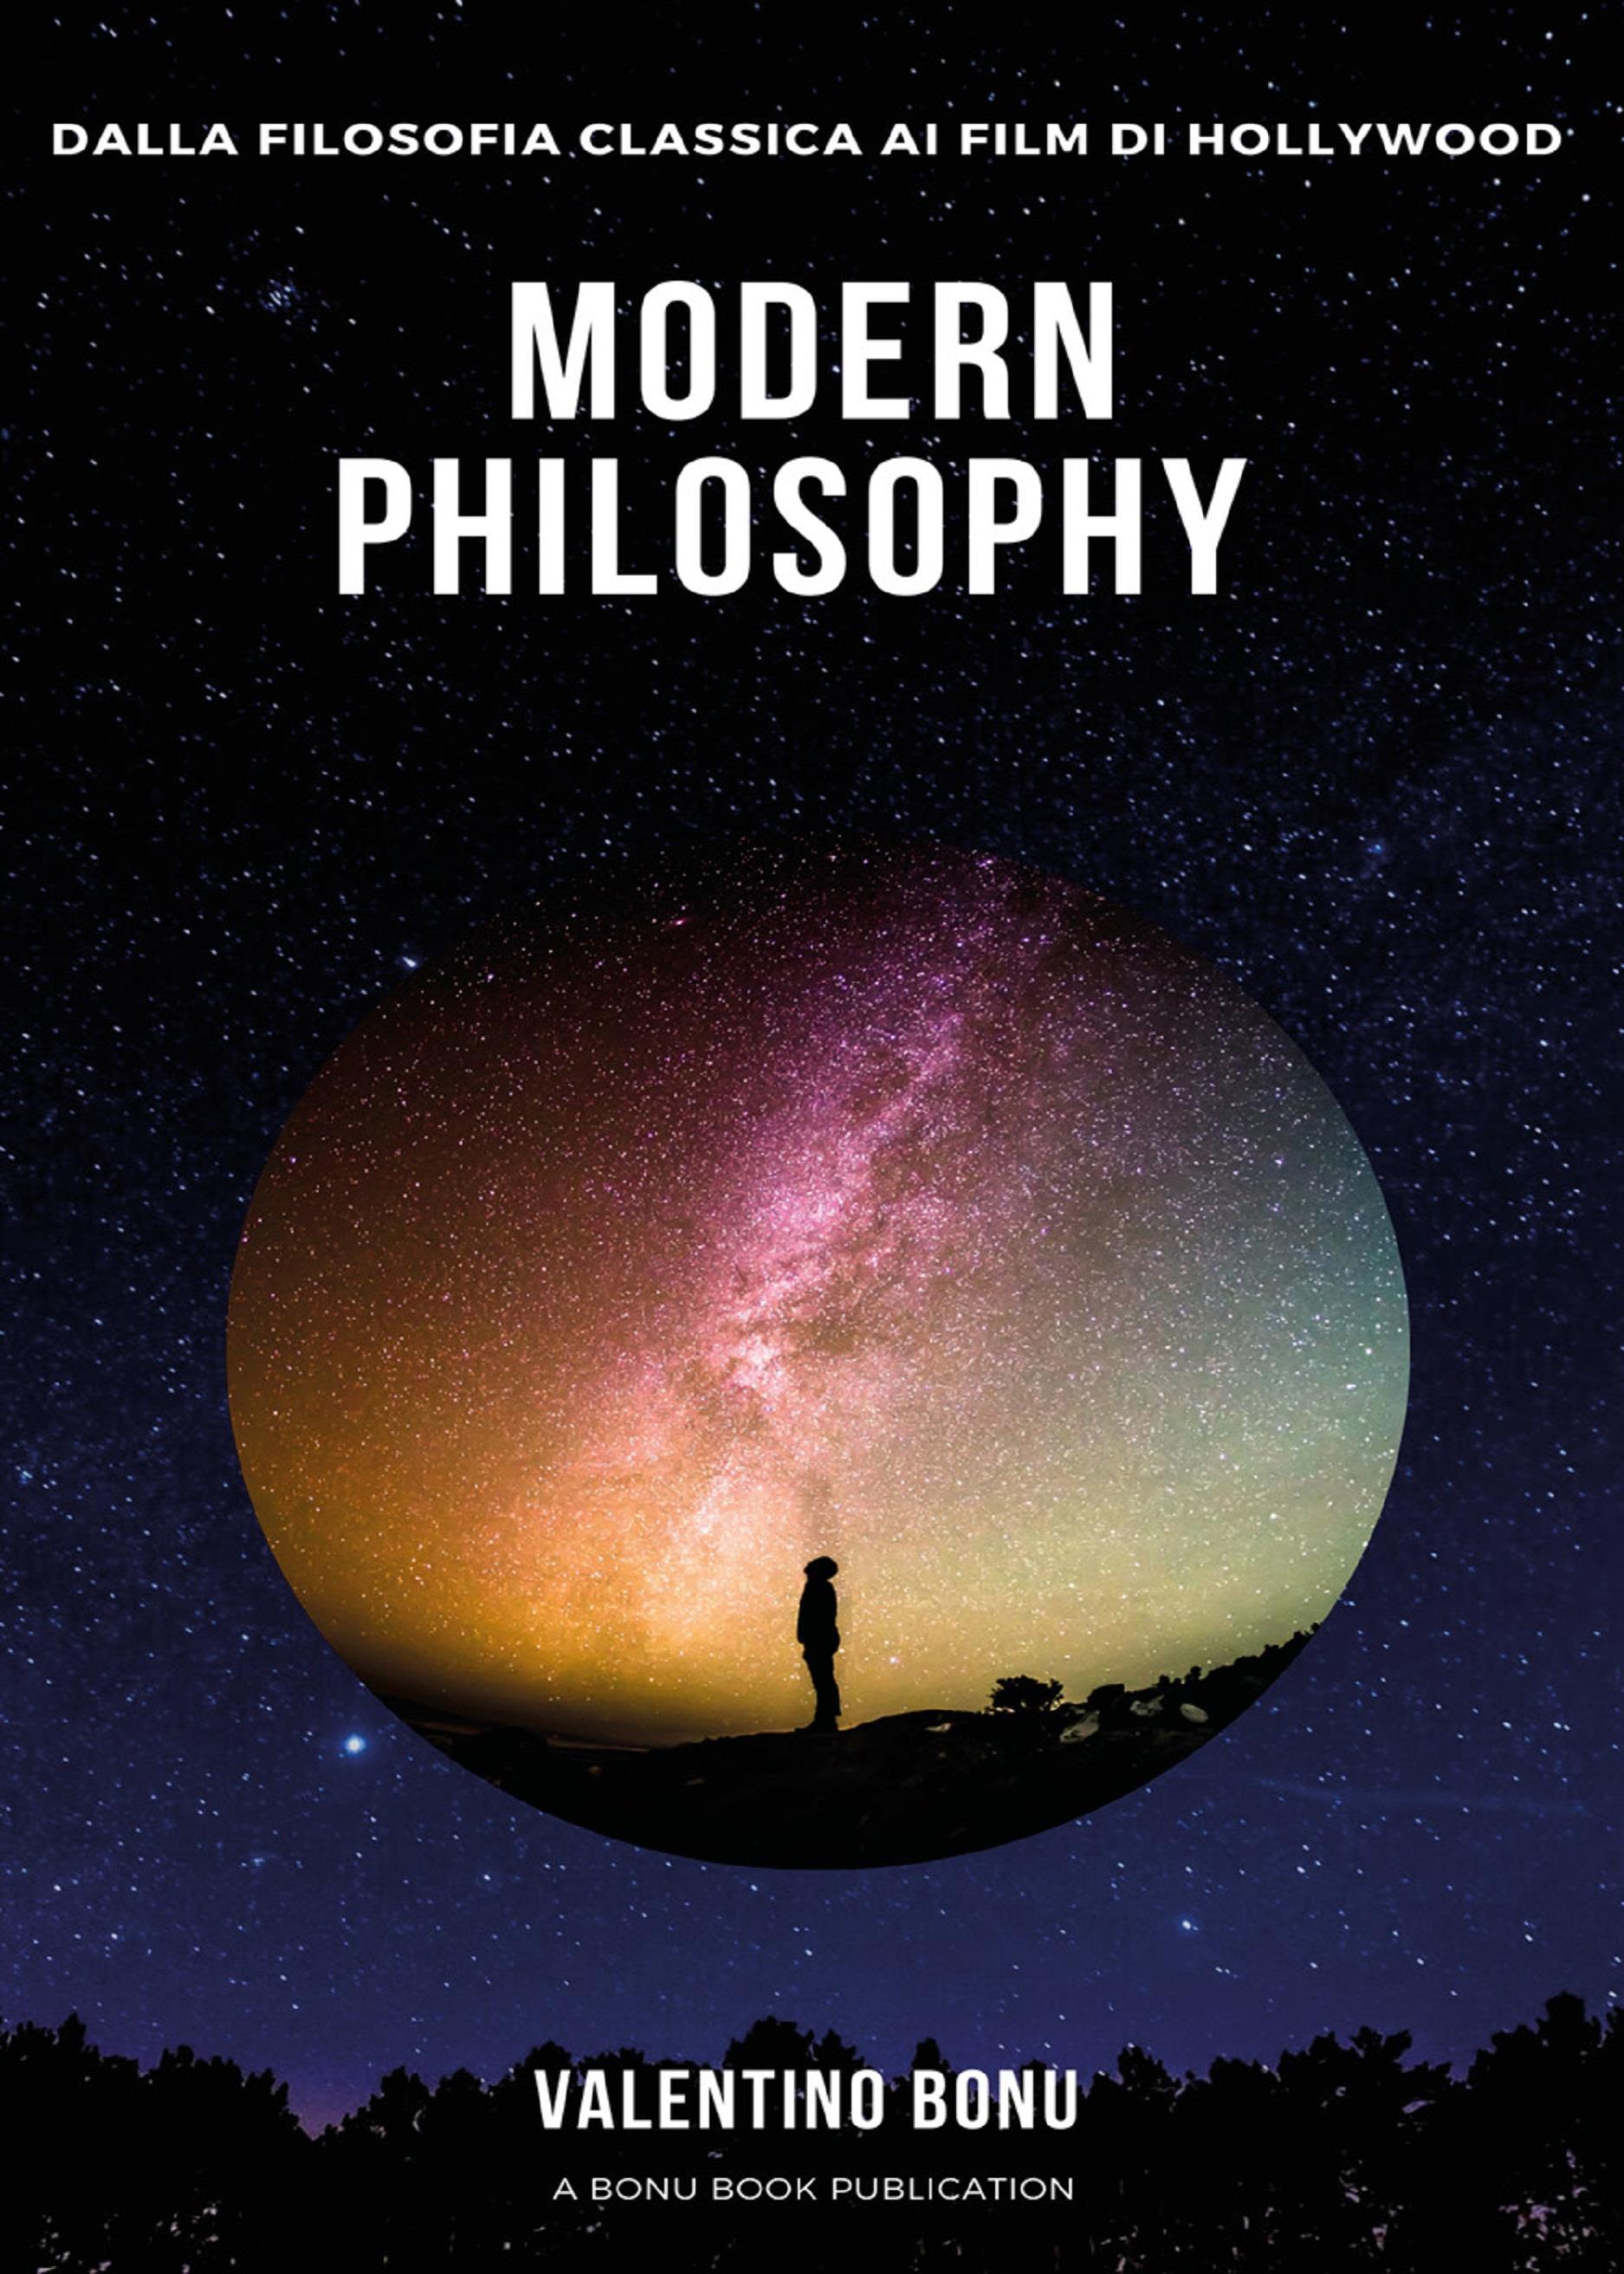 Modern Philosophy. Dalla filosofia classica ai film di Hollywood